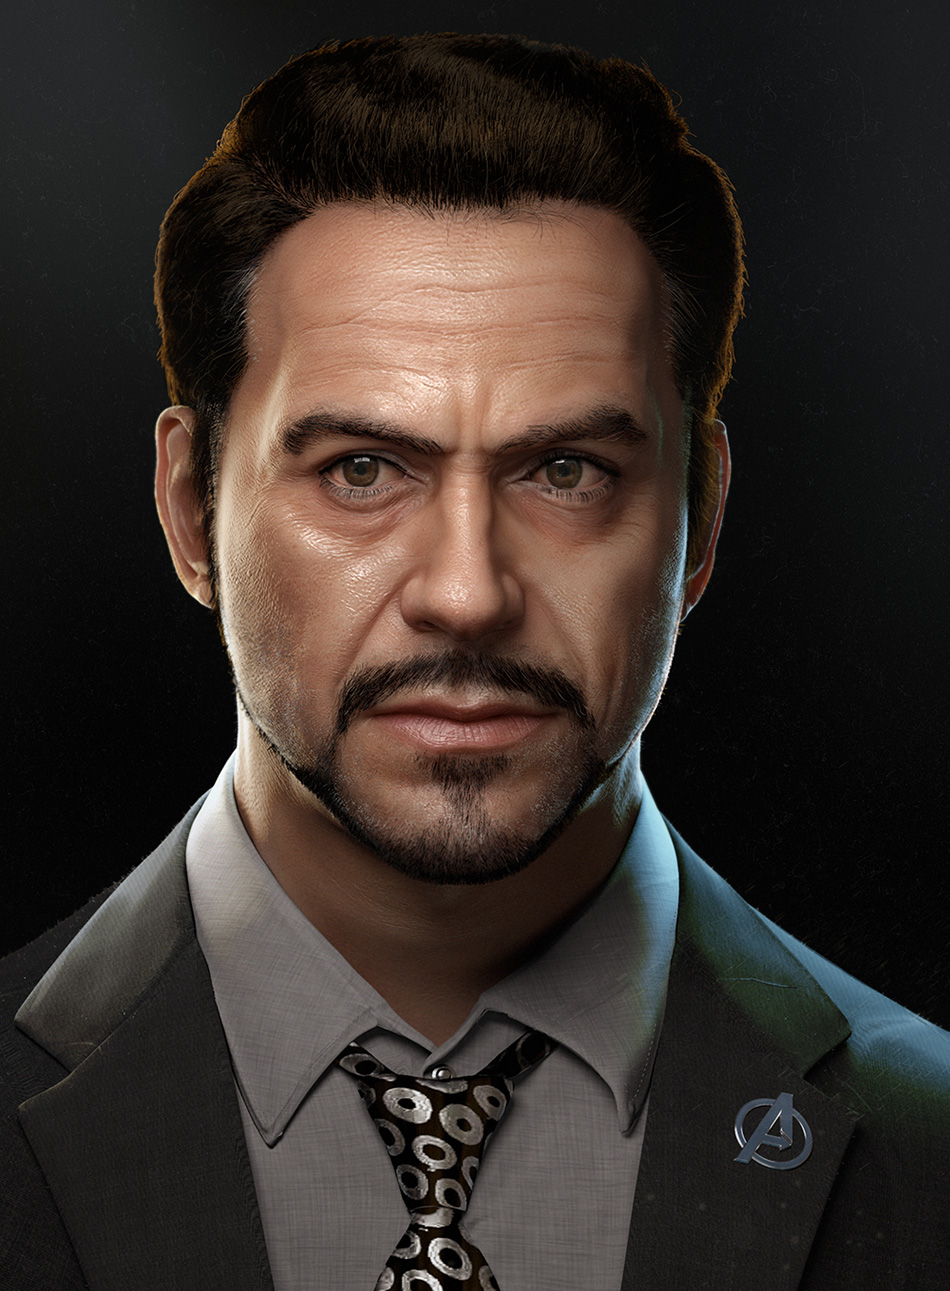 Tony stark 3d illustra...